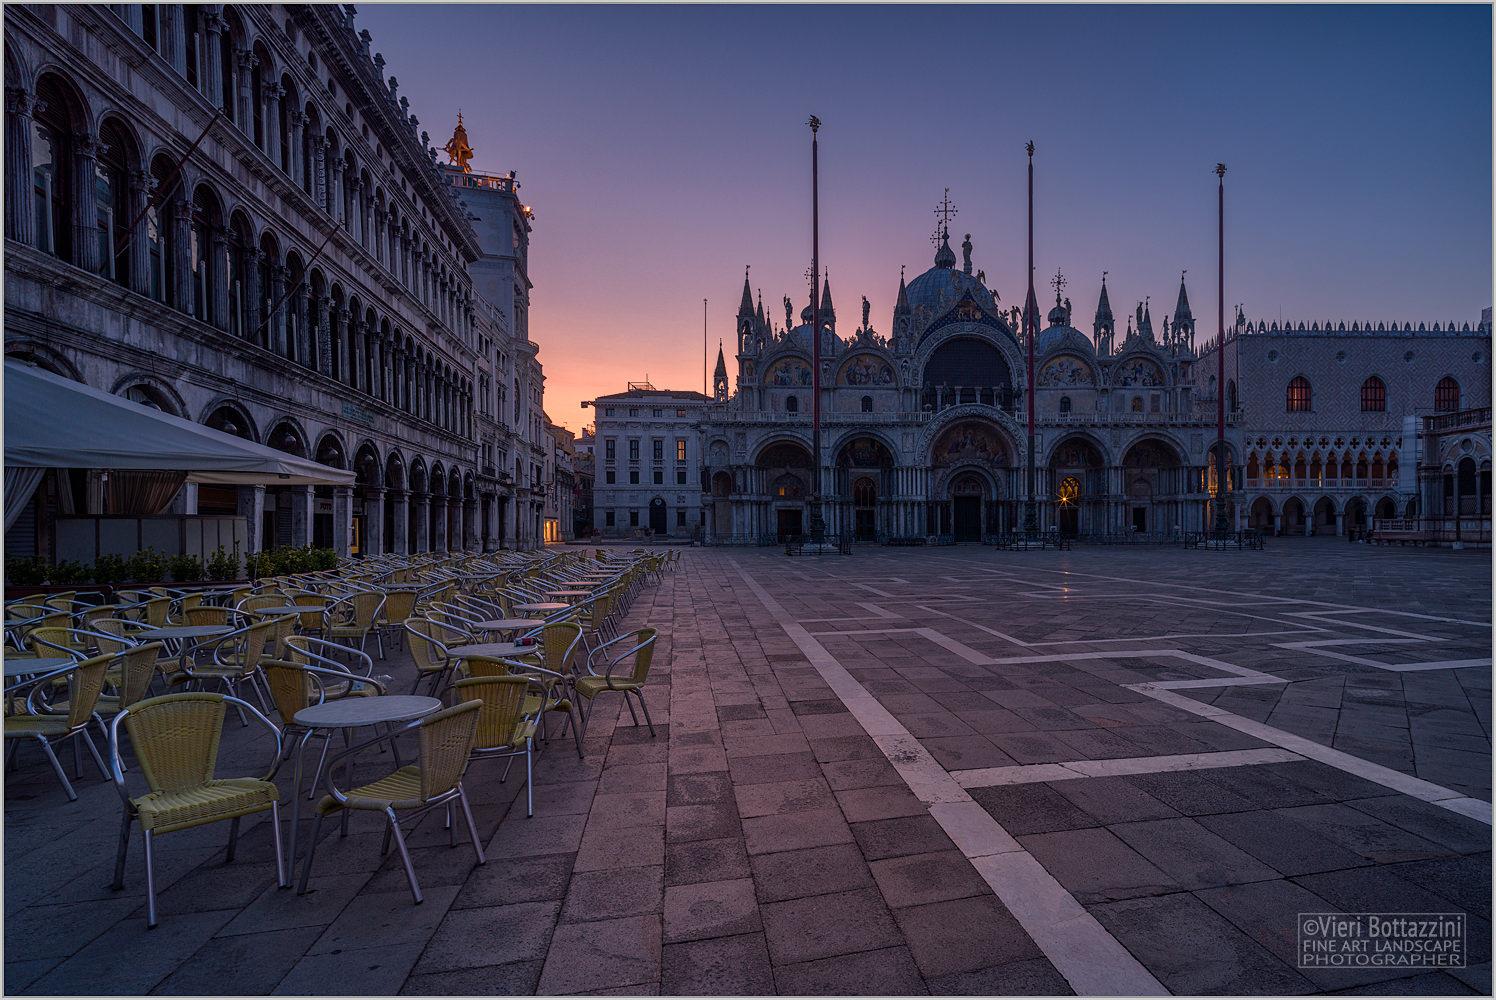 St. Mark's Square at dawn...